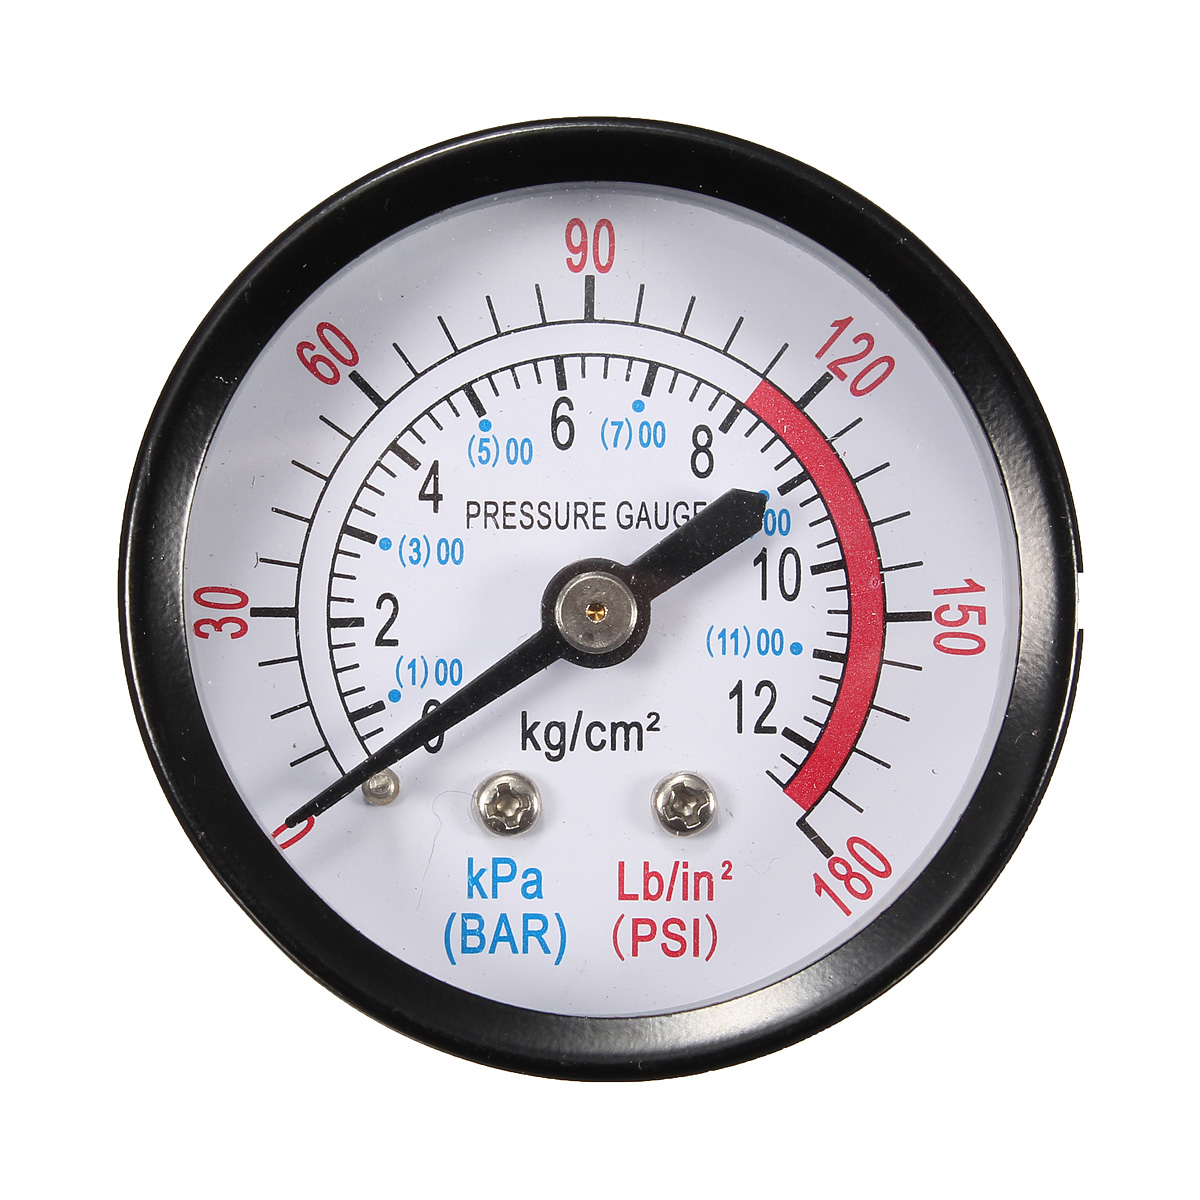 New 0-180PSI Air Compressor Pneumatic Hydraulic Fluid Pressure Gauge 0-12Bar \